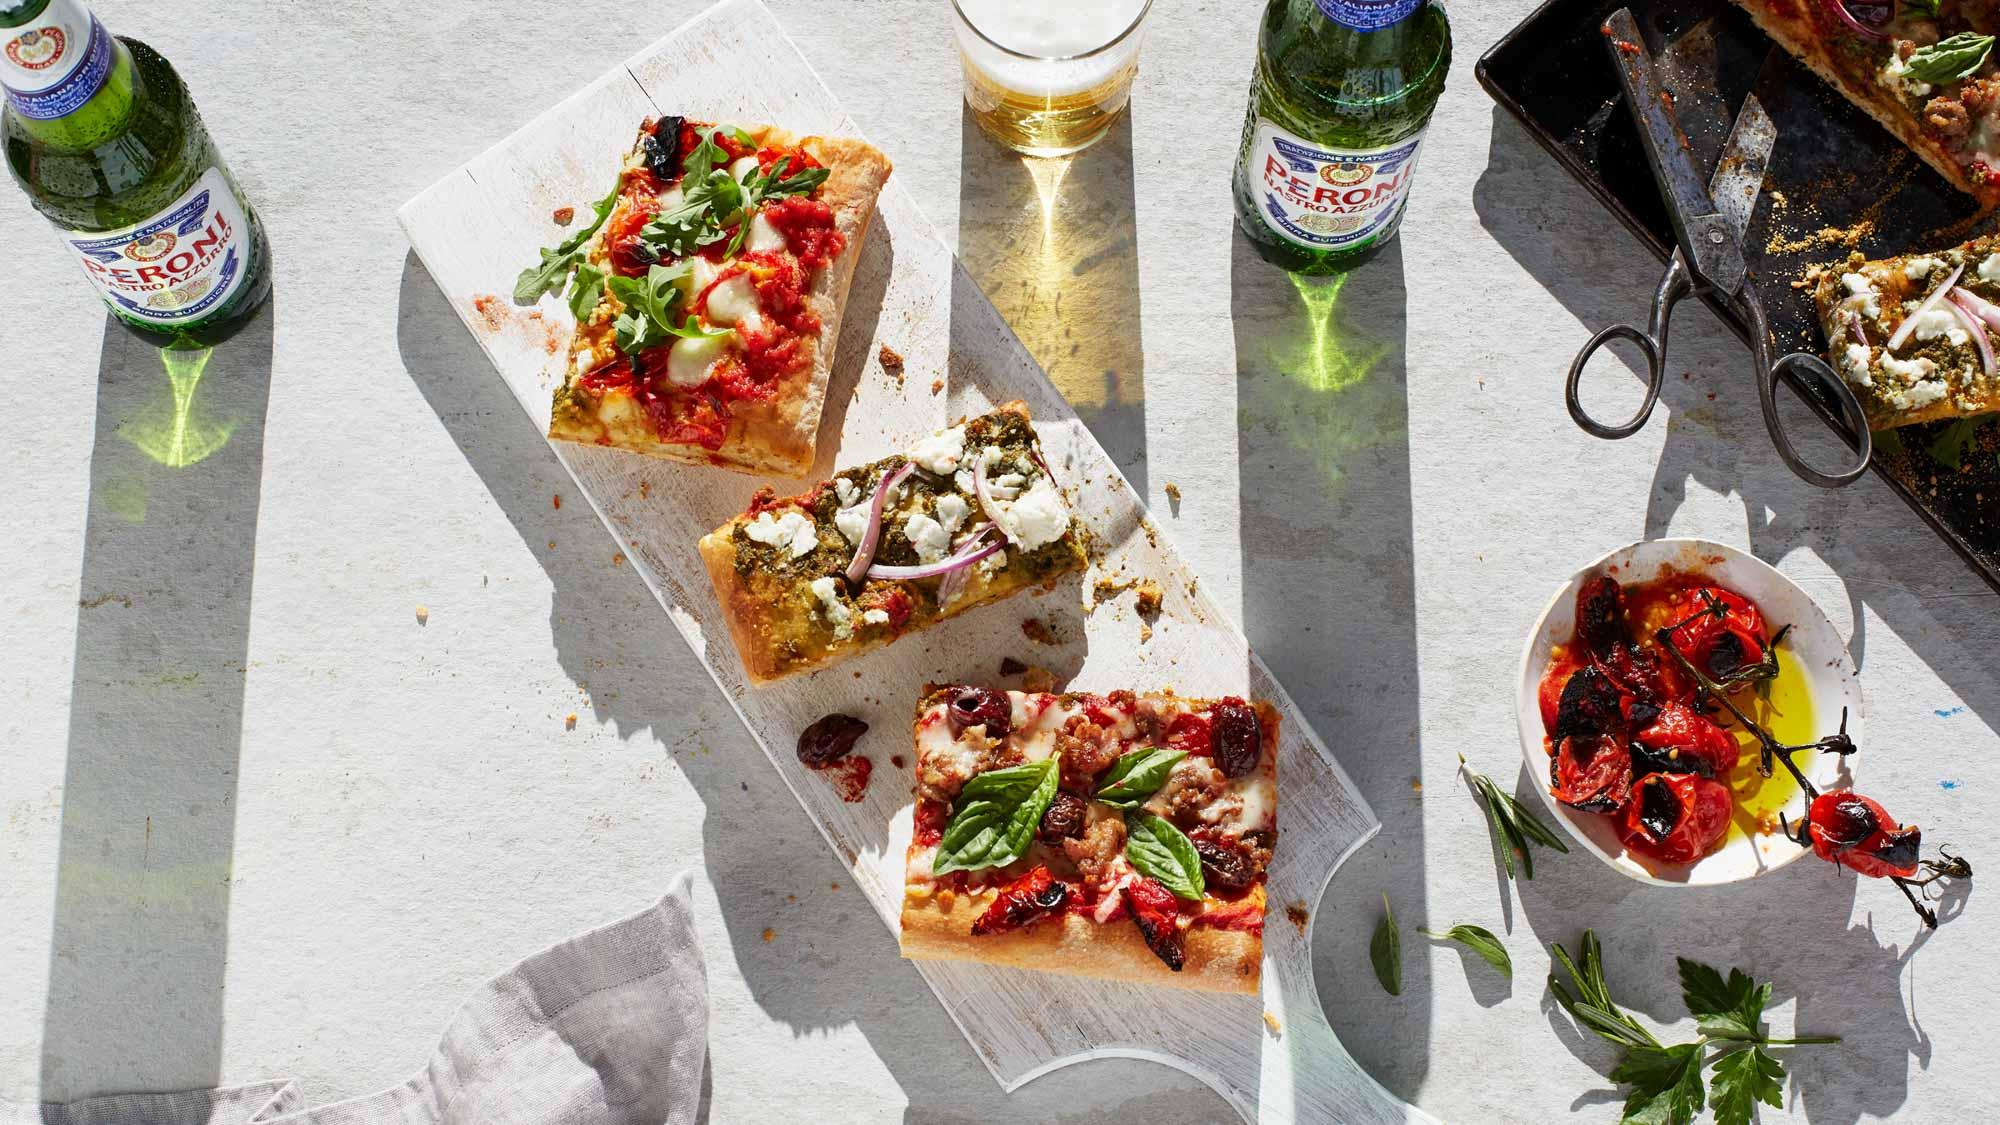 isaiah_jay_italian_food_01.jpg